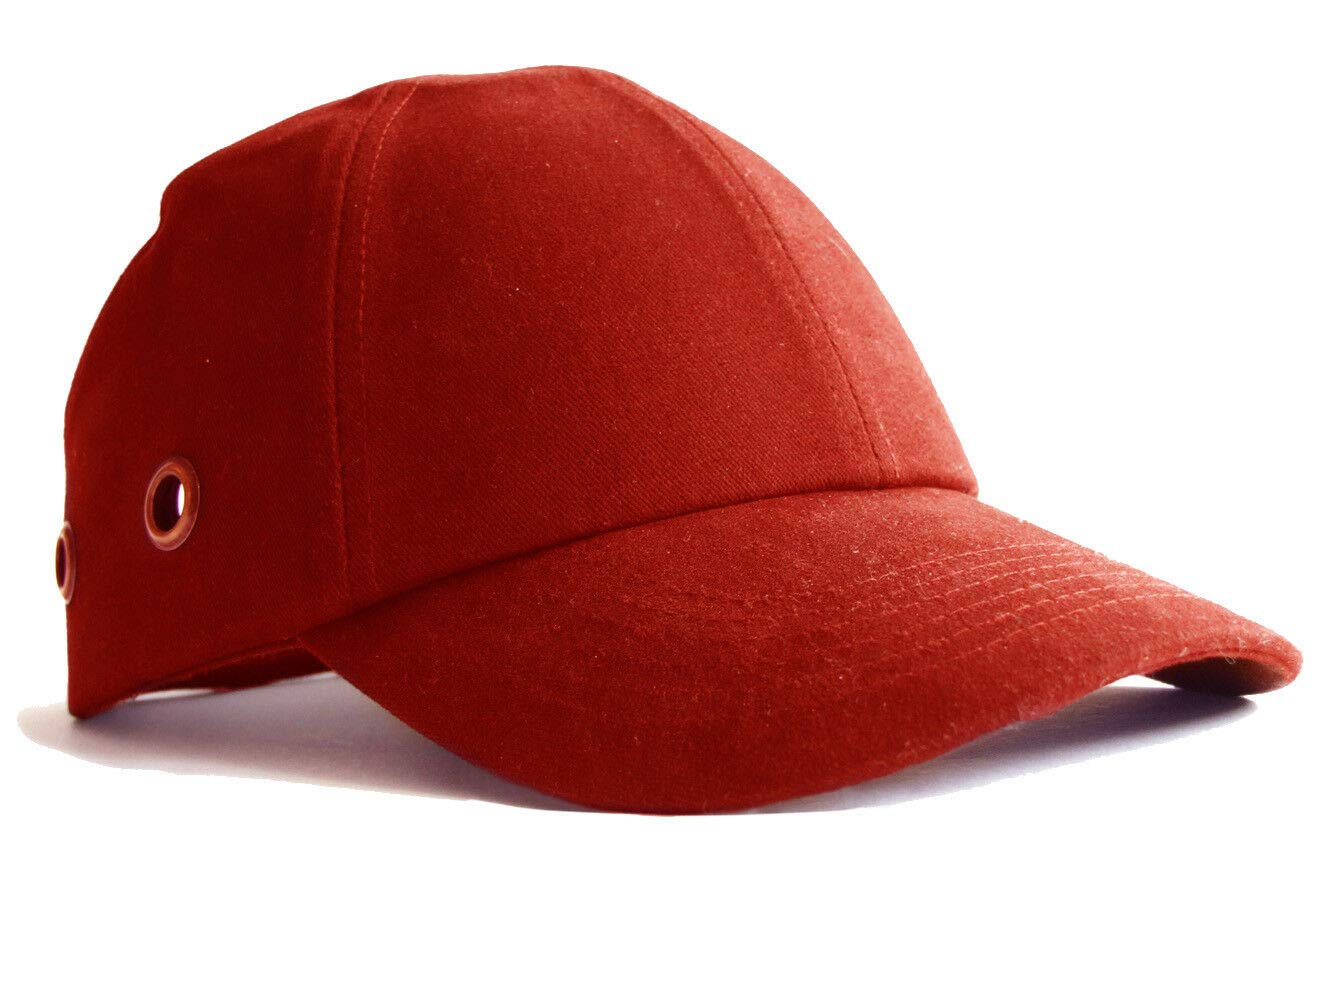 Navy Safety Baseball Cap Hard Hat Bump Cap Vented Velcro Fastening Adjustable